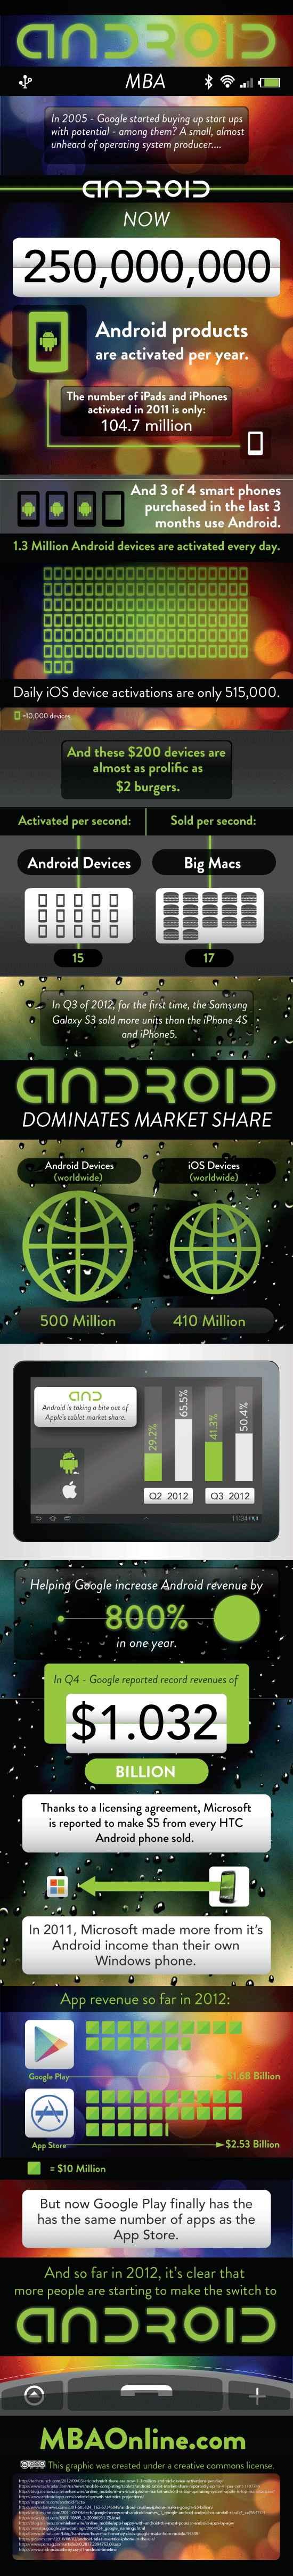 Android superando a iOS dentro de poco